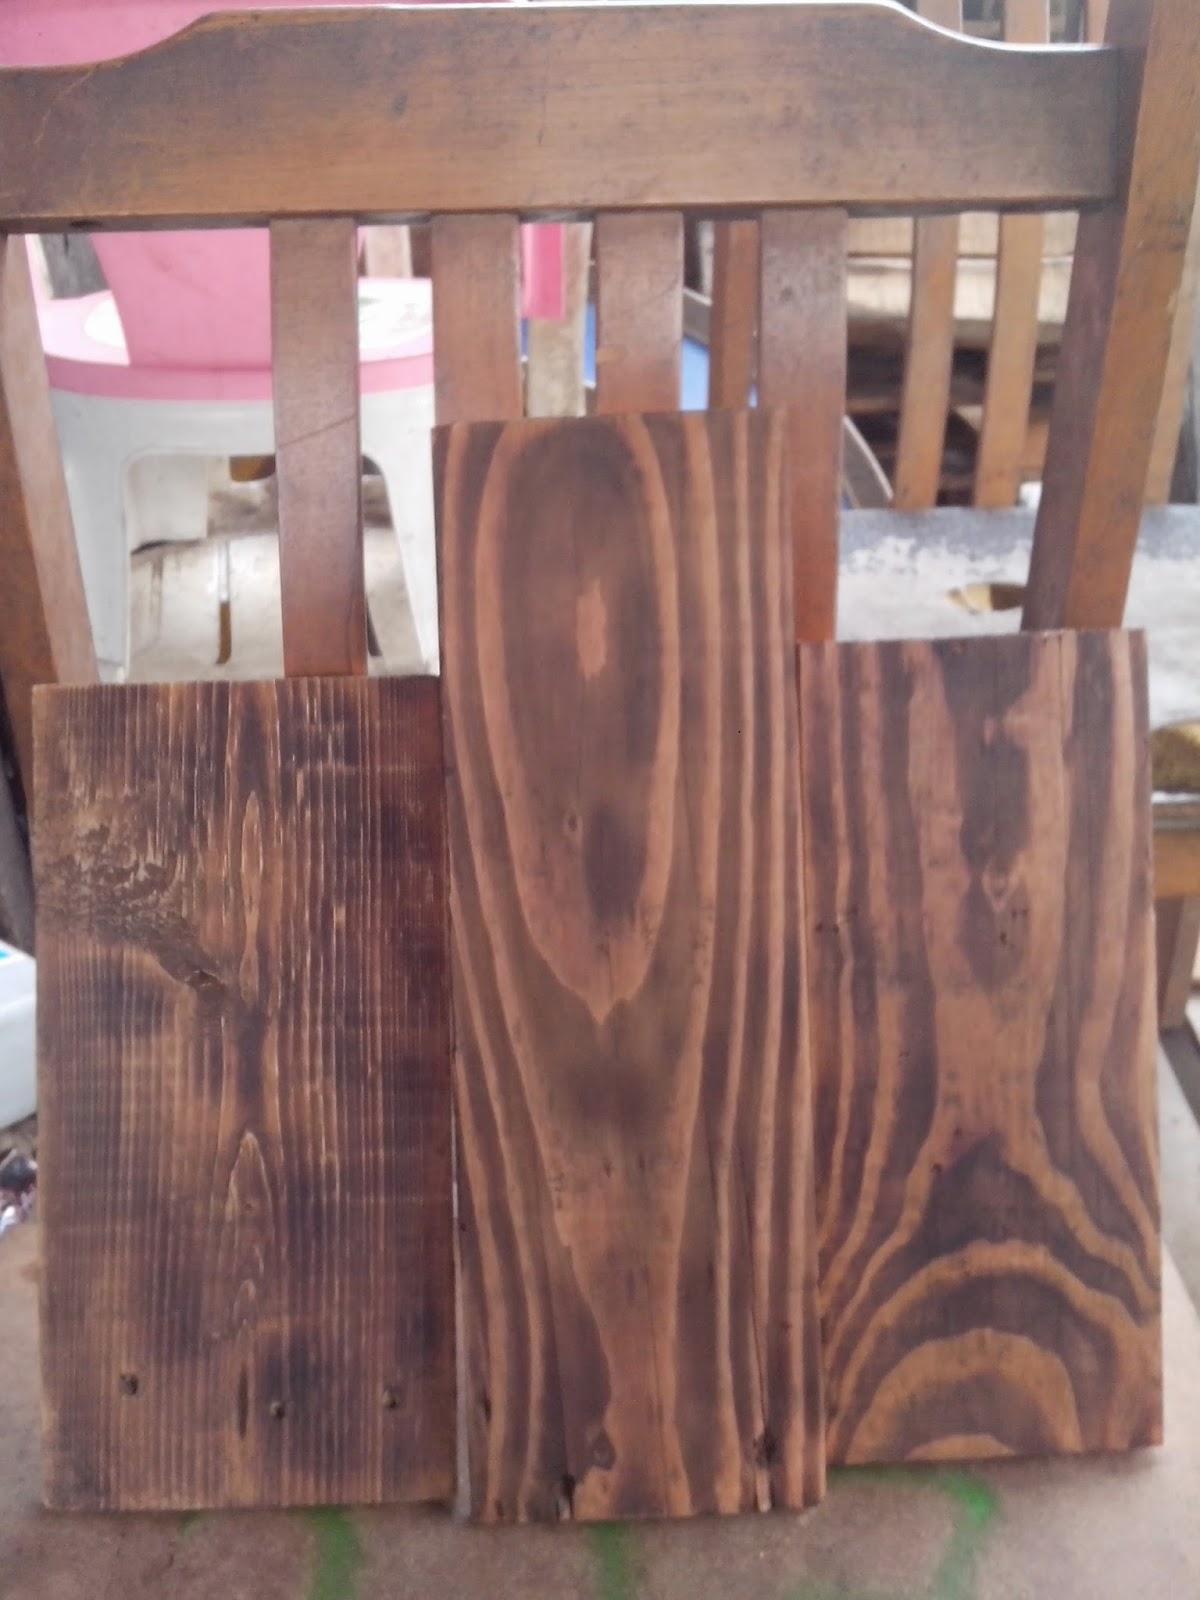 kayu jati belanda, kayu jati belanda finishing bakar, kayu jati belanda efek bakar, urat kayu jati belanda